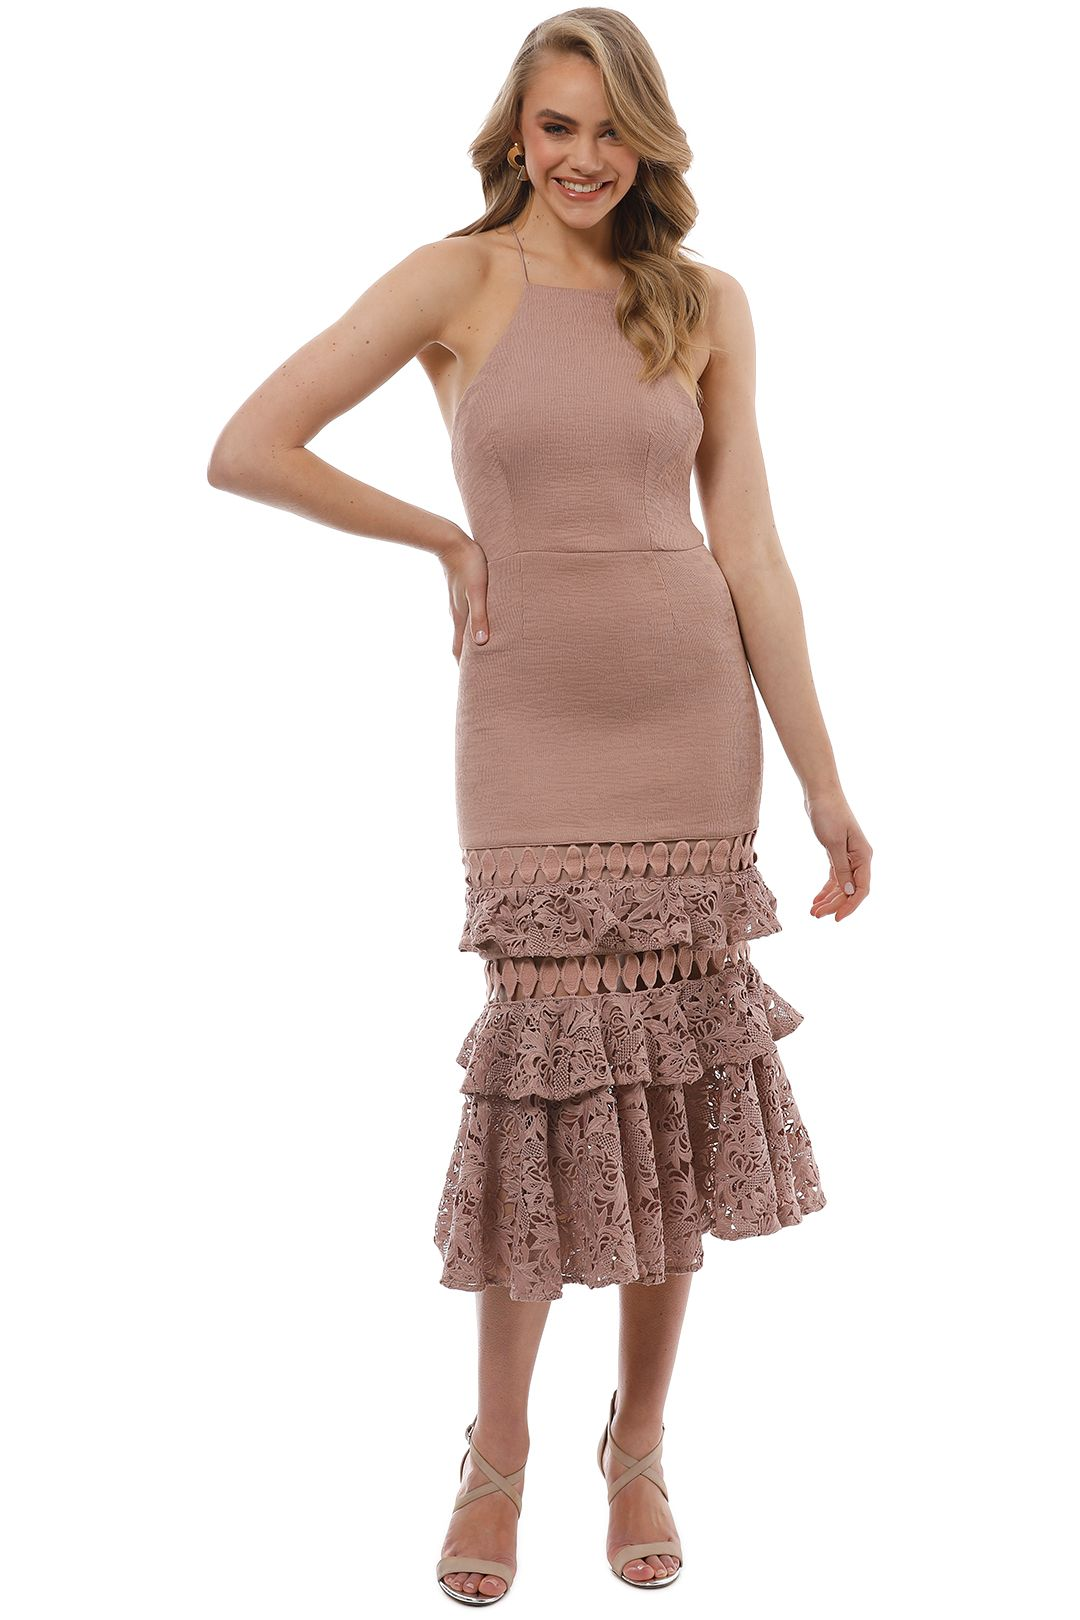 Talulah - Valencia Rose Halter Ruffle Midi Dress - Pink - Front